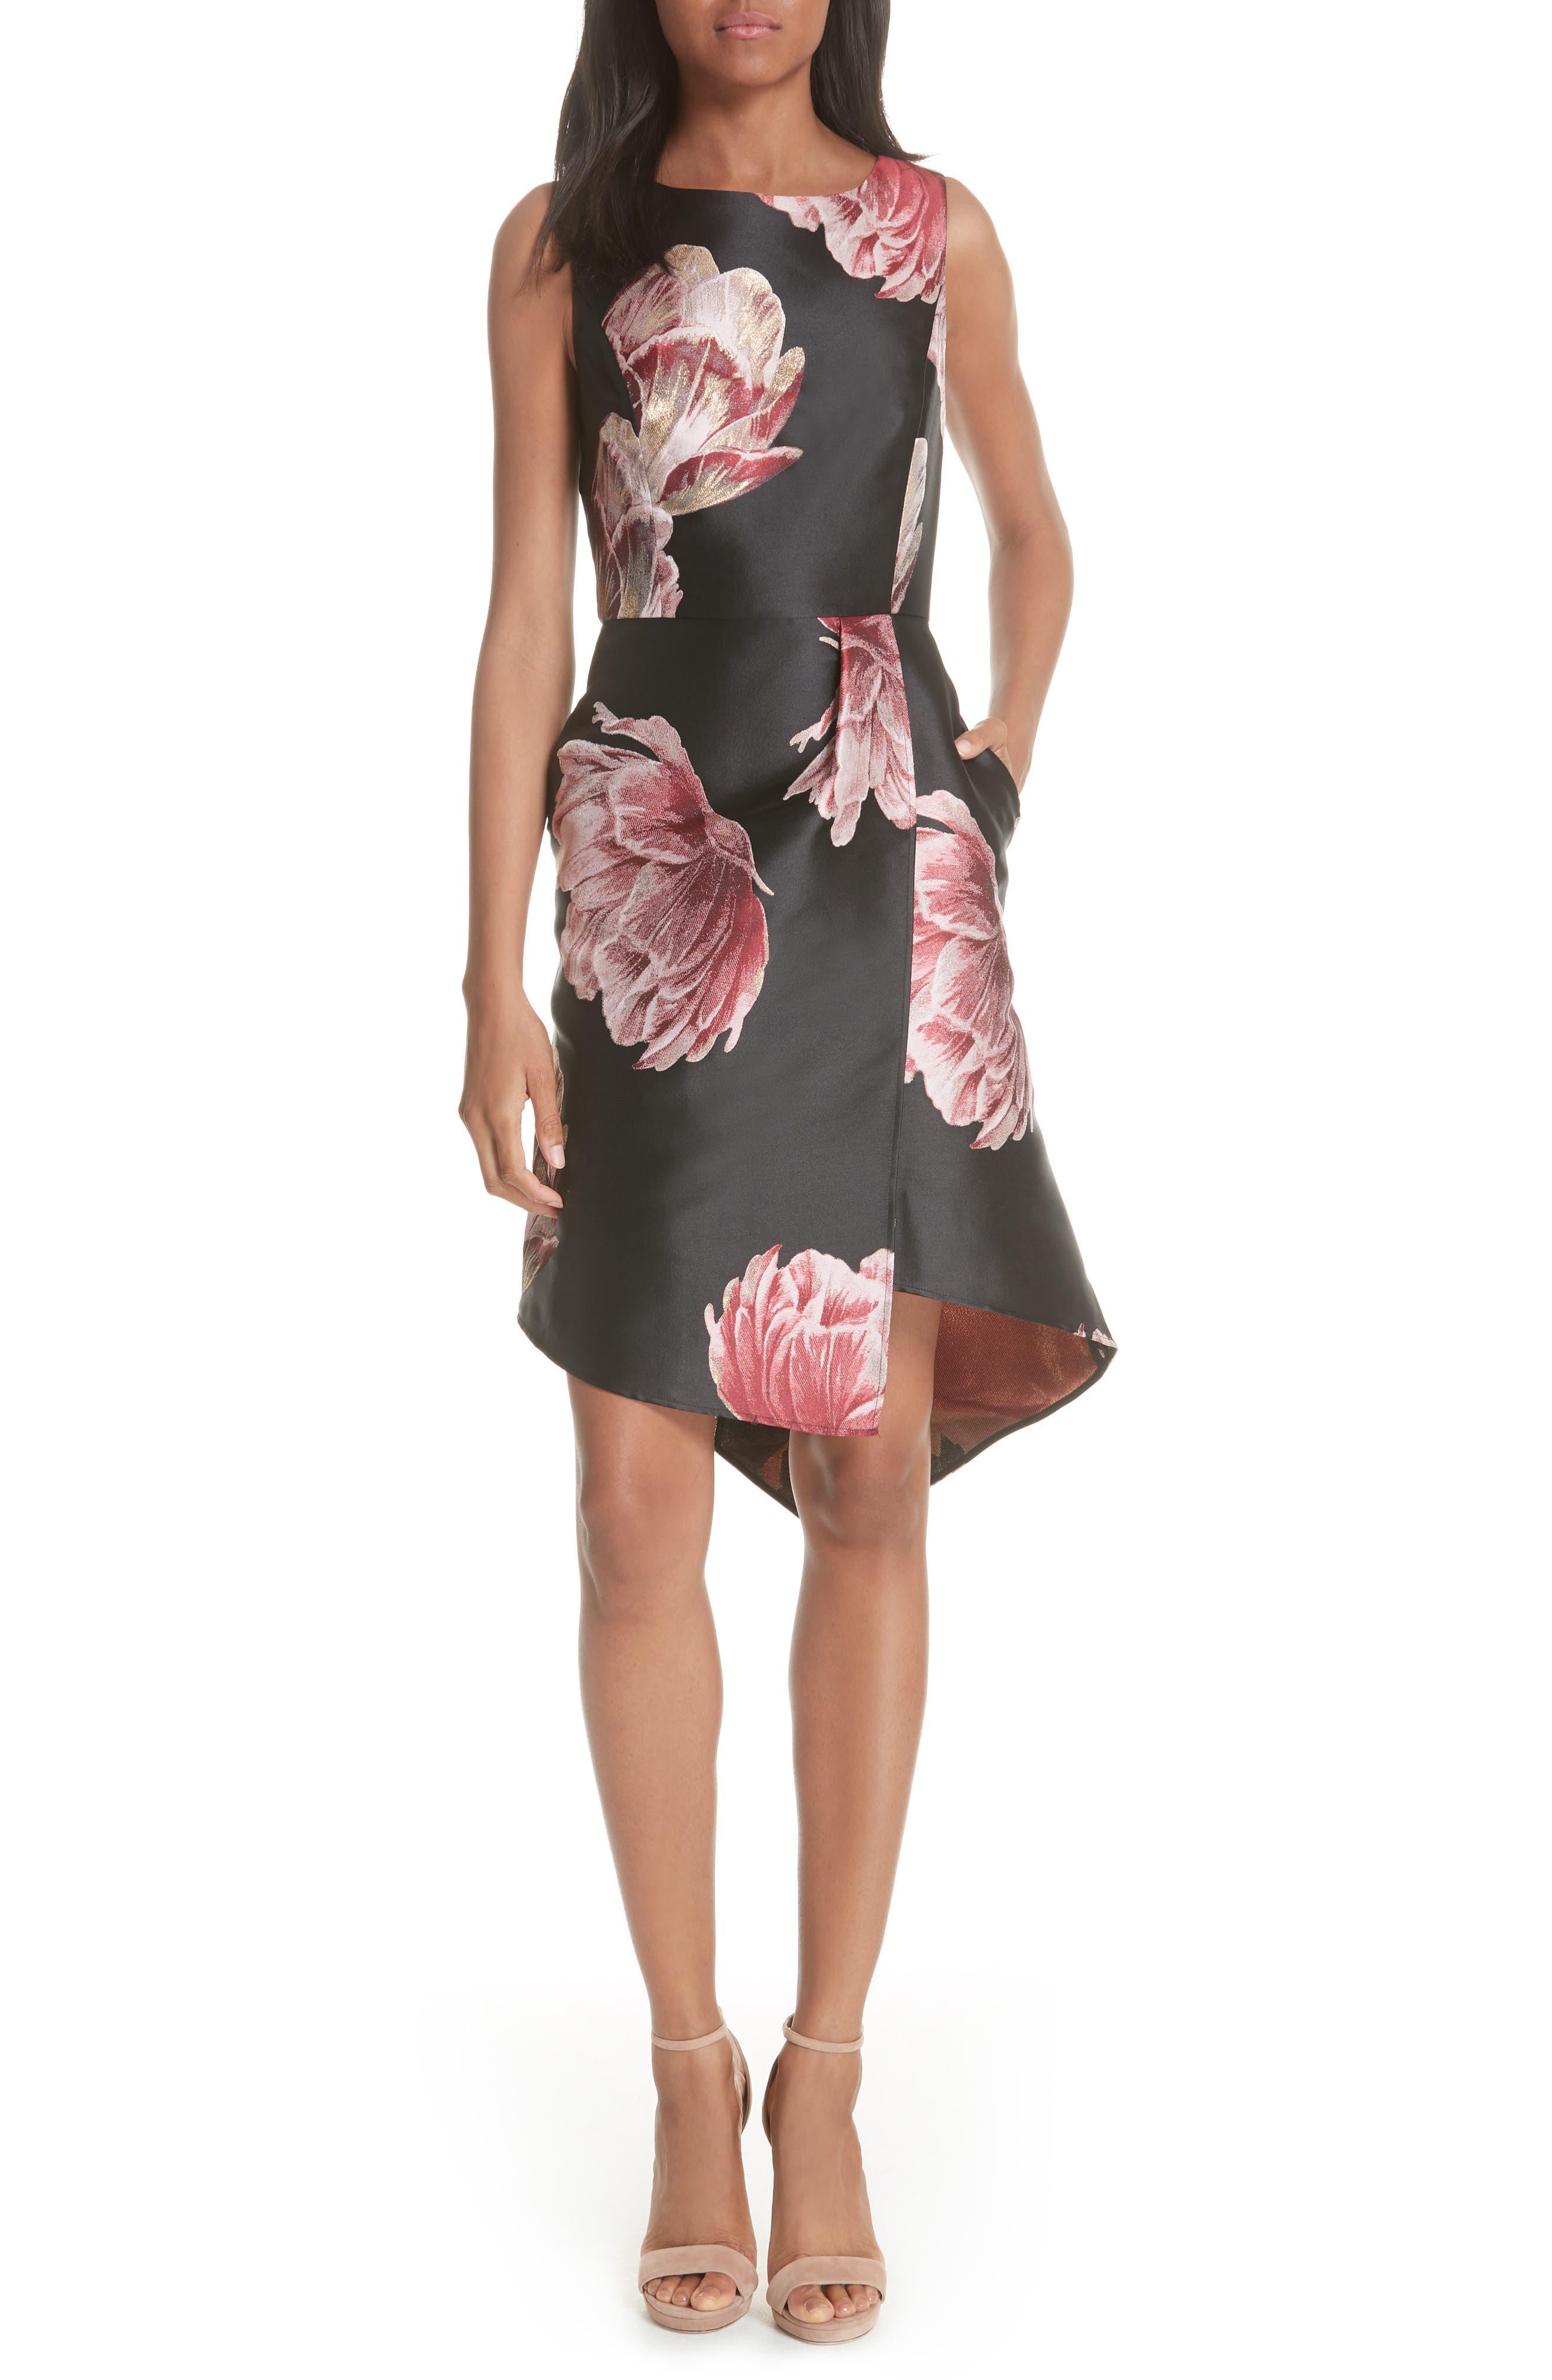 Eyvii Bay of Honour Asymmetrical Dress,                         Main,                         color, 001